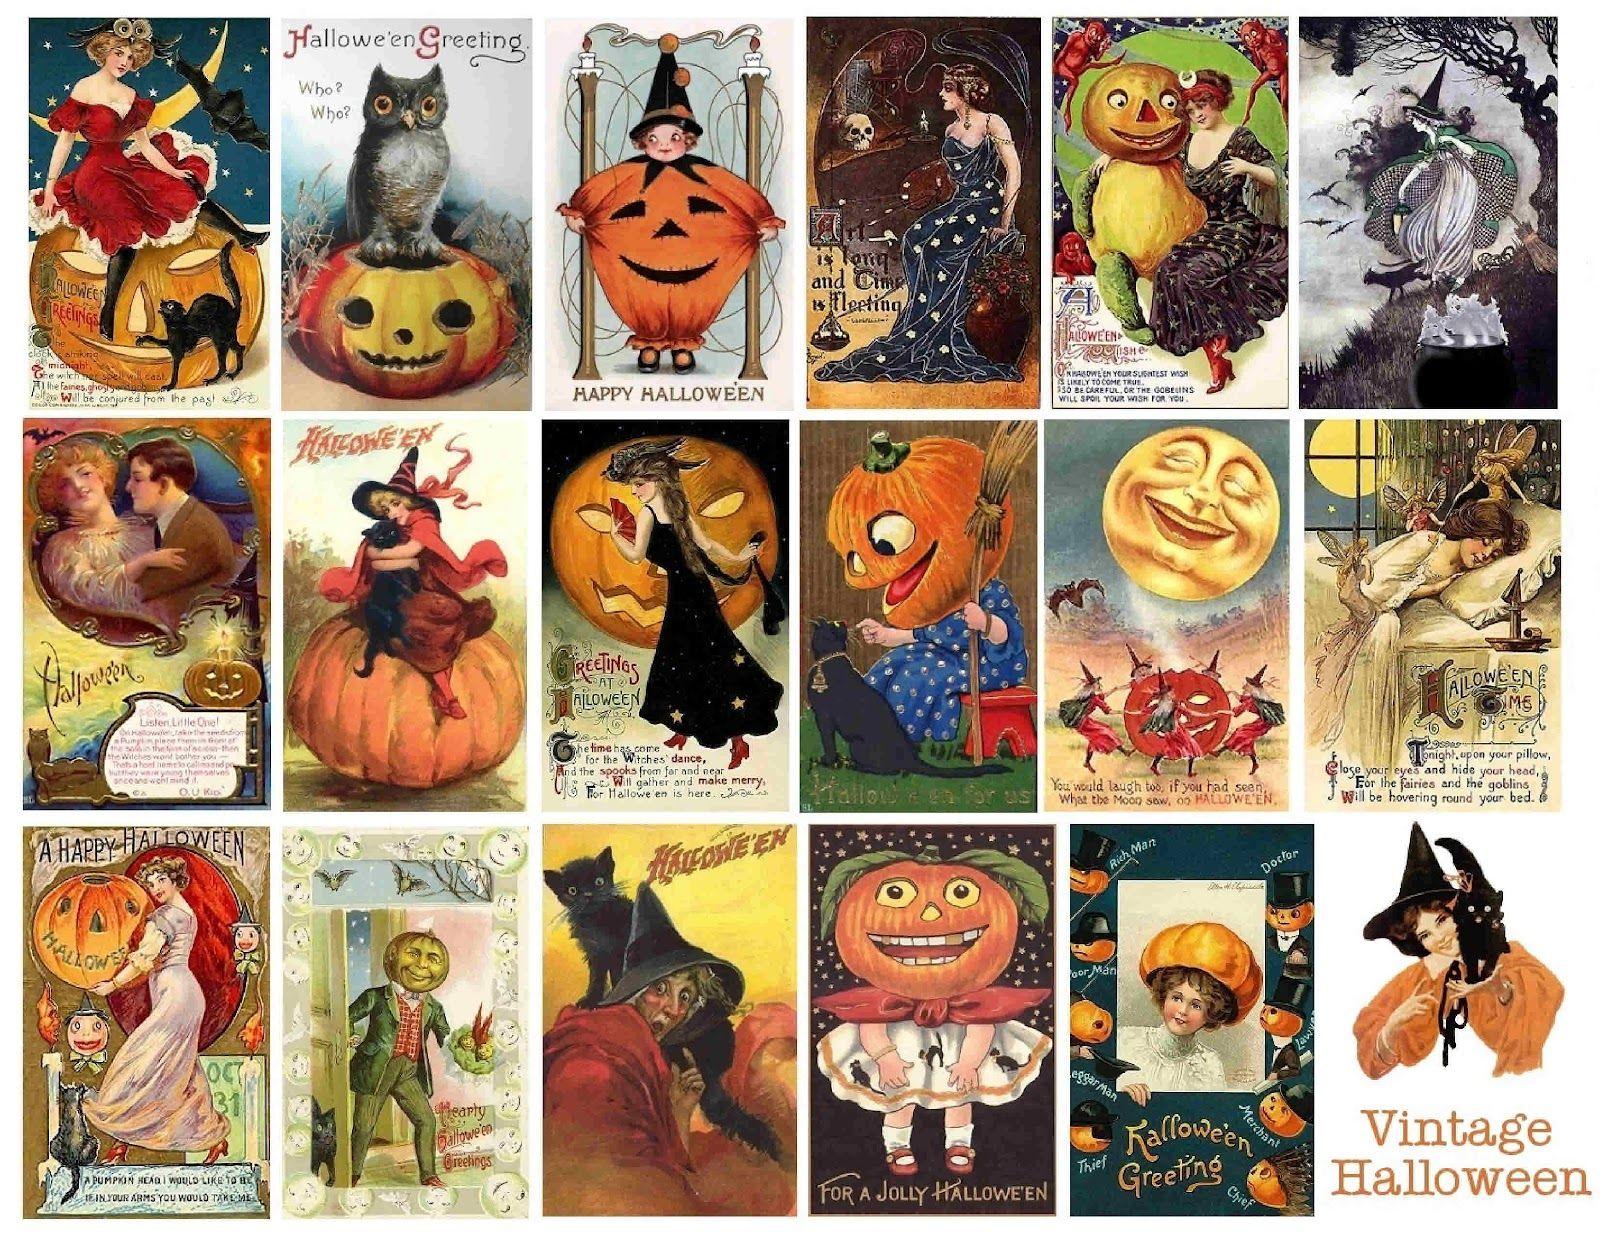 Sympletymes Cloth Art By Sherrie Nordgren Free Vintage Printable Halloween Collage Vintage Halloween Printables Vintage Halloween Cards Halloween Prints